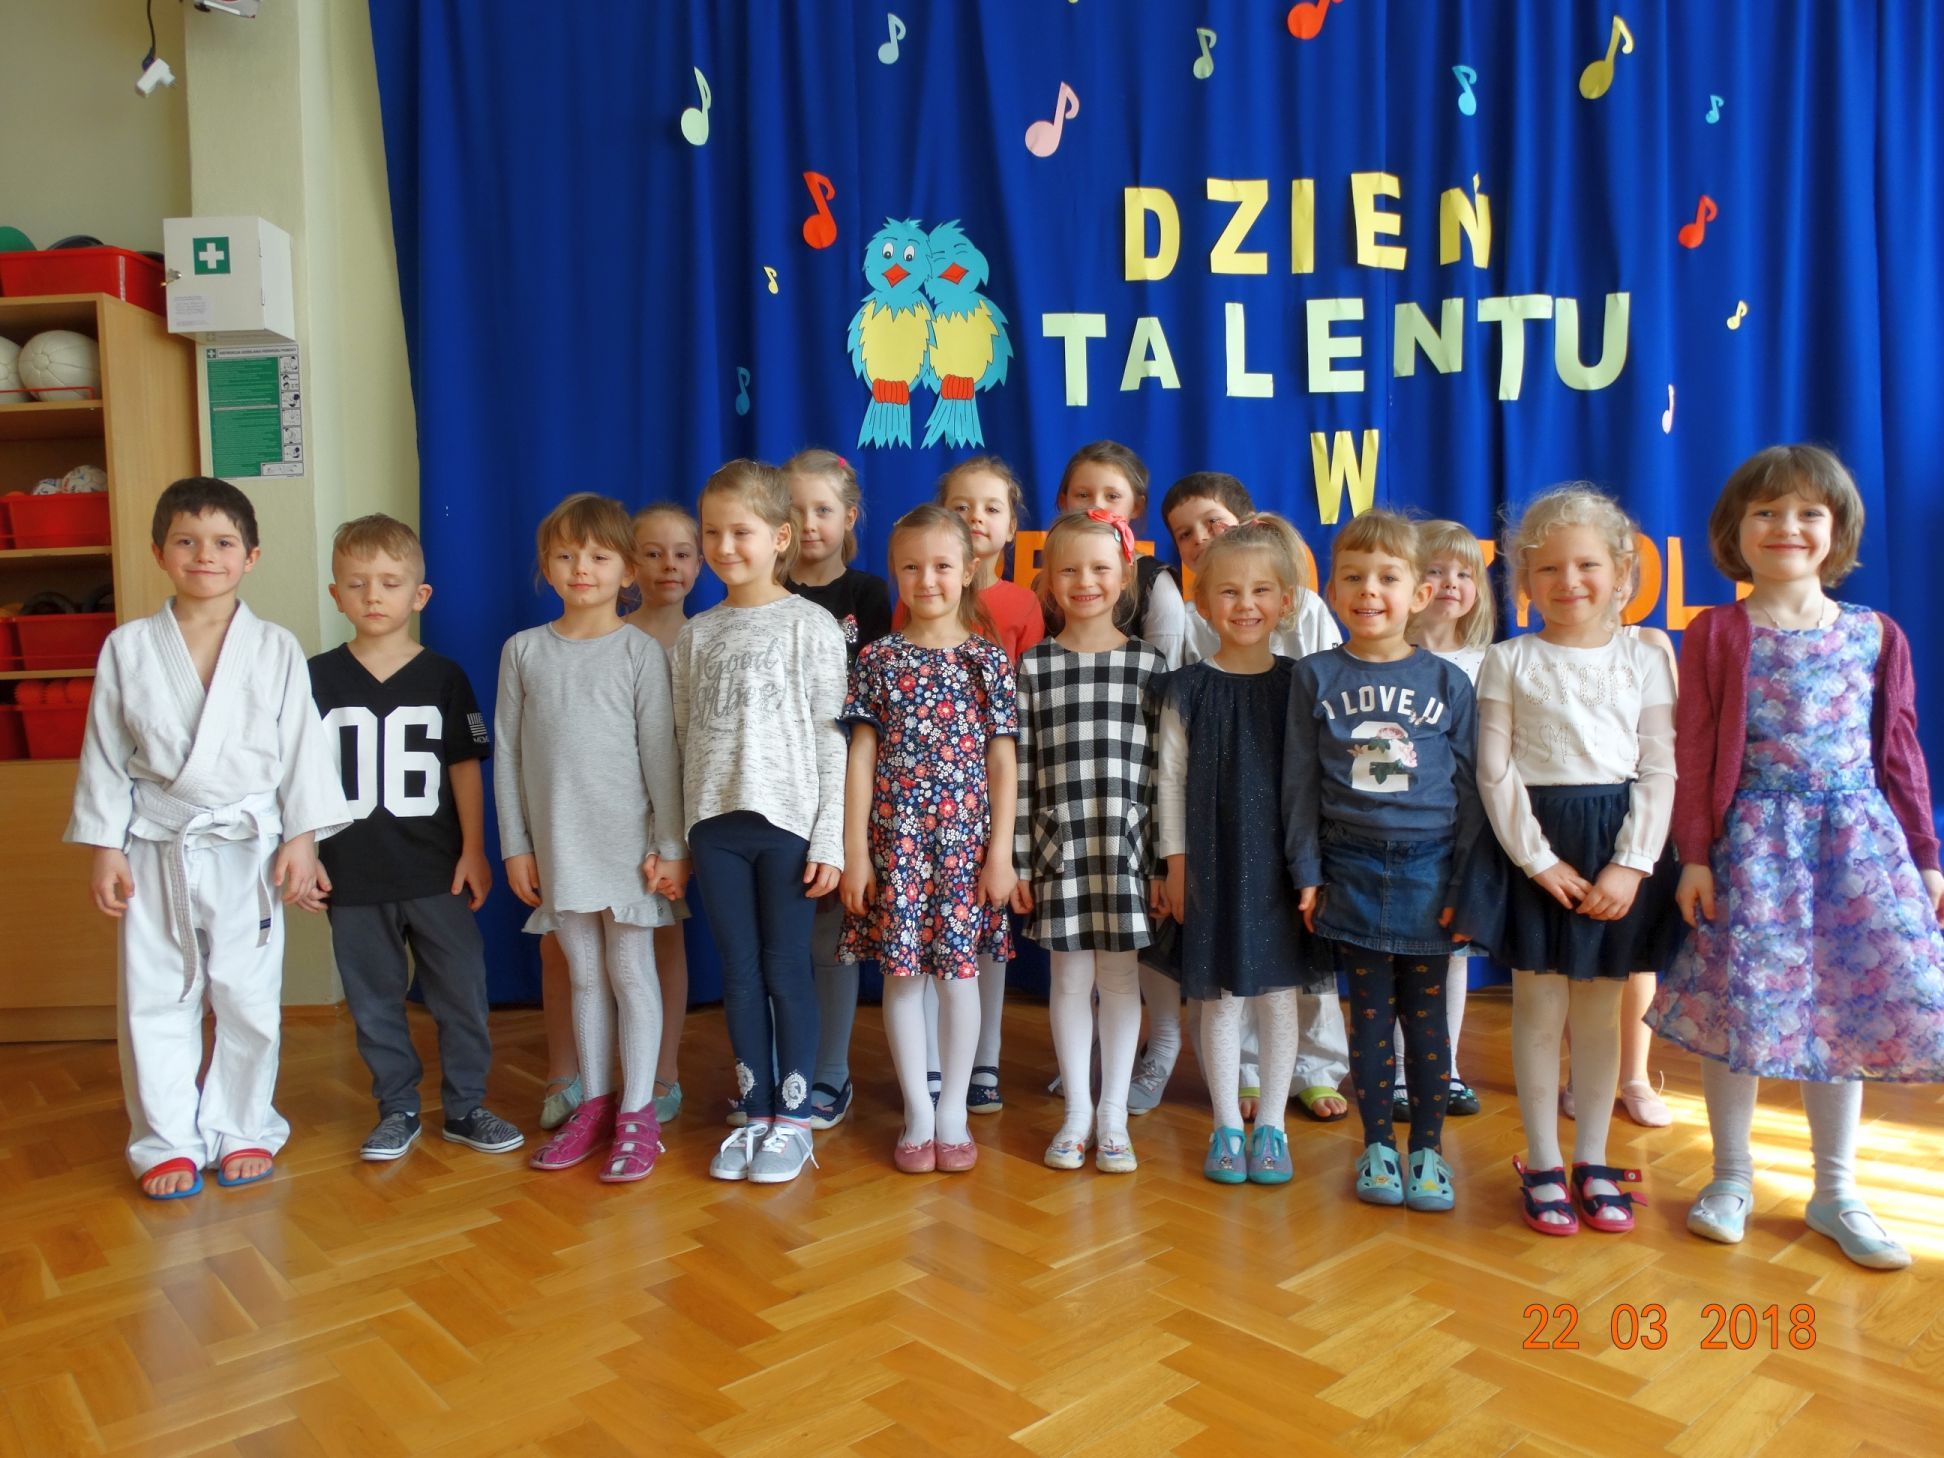 Dzien talentow 2018 (14)